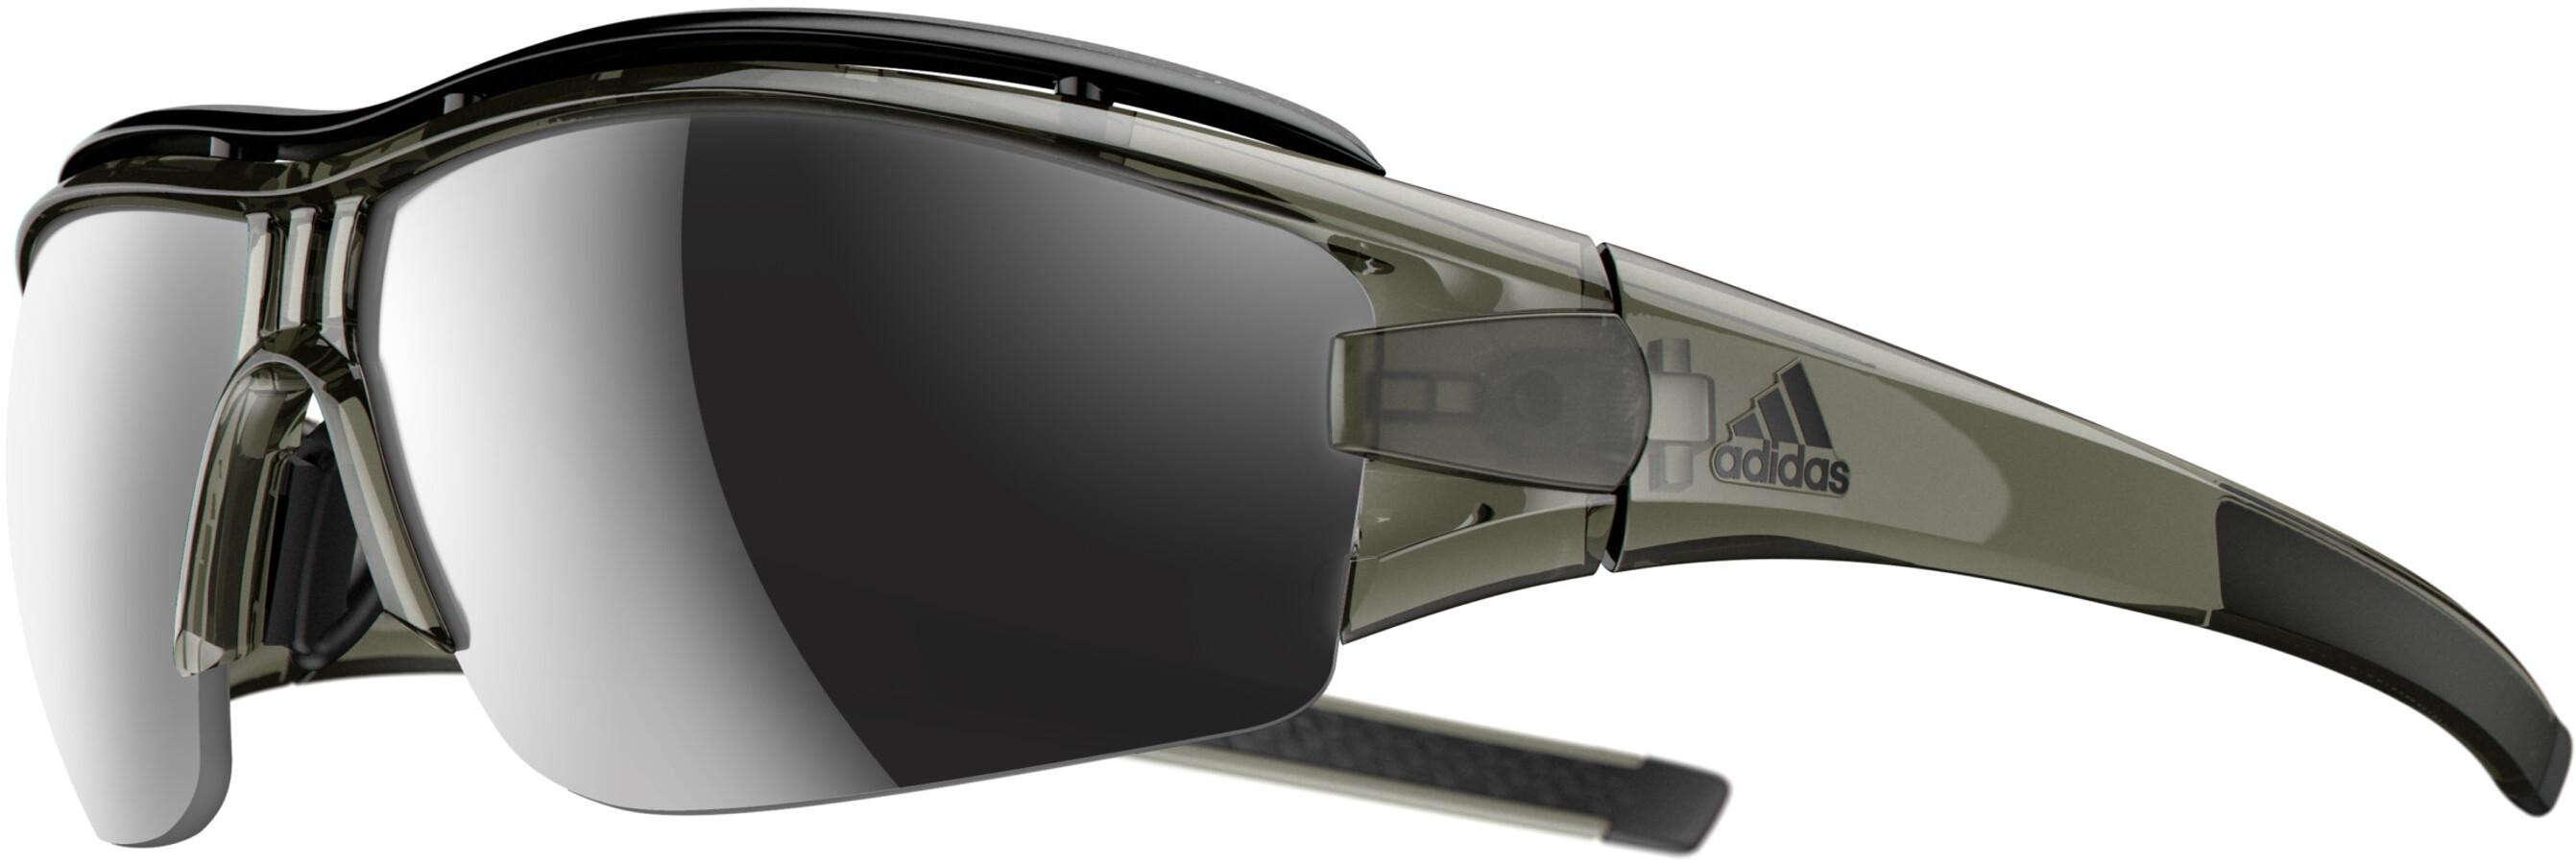 adidas evil eye halfrim pro glasses l cargo shiny chrome. Black Bedroom Furniture Sets. Home Design Ideas